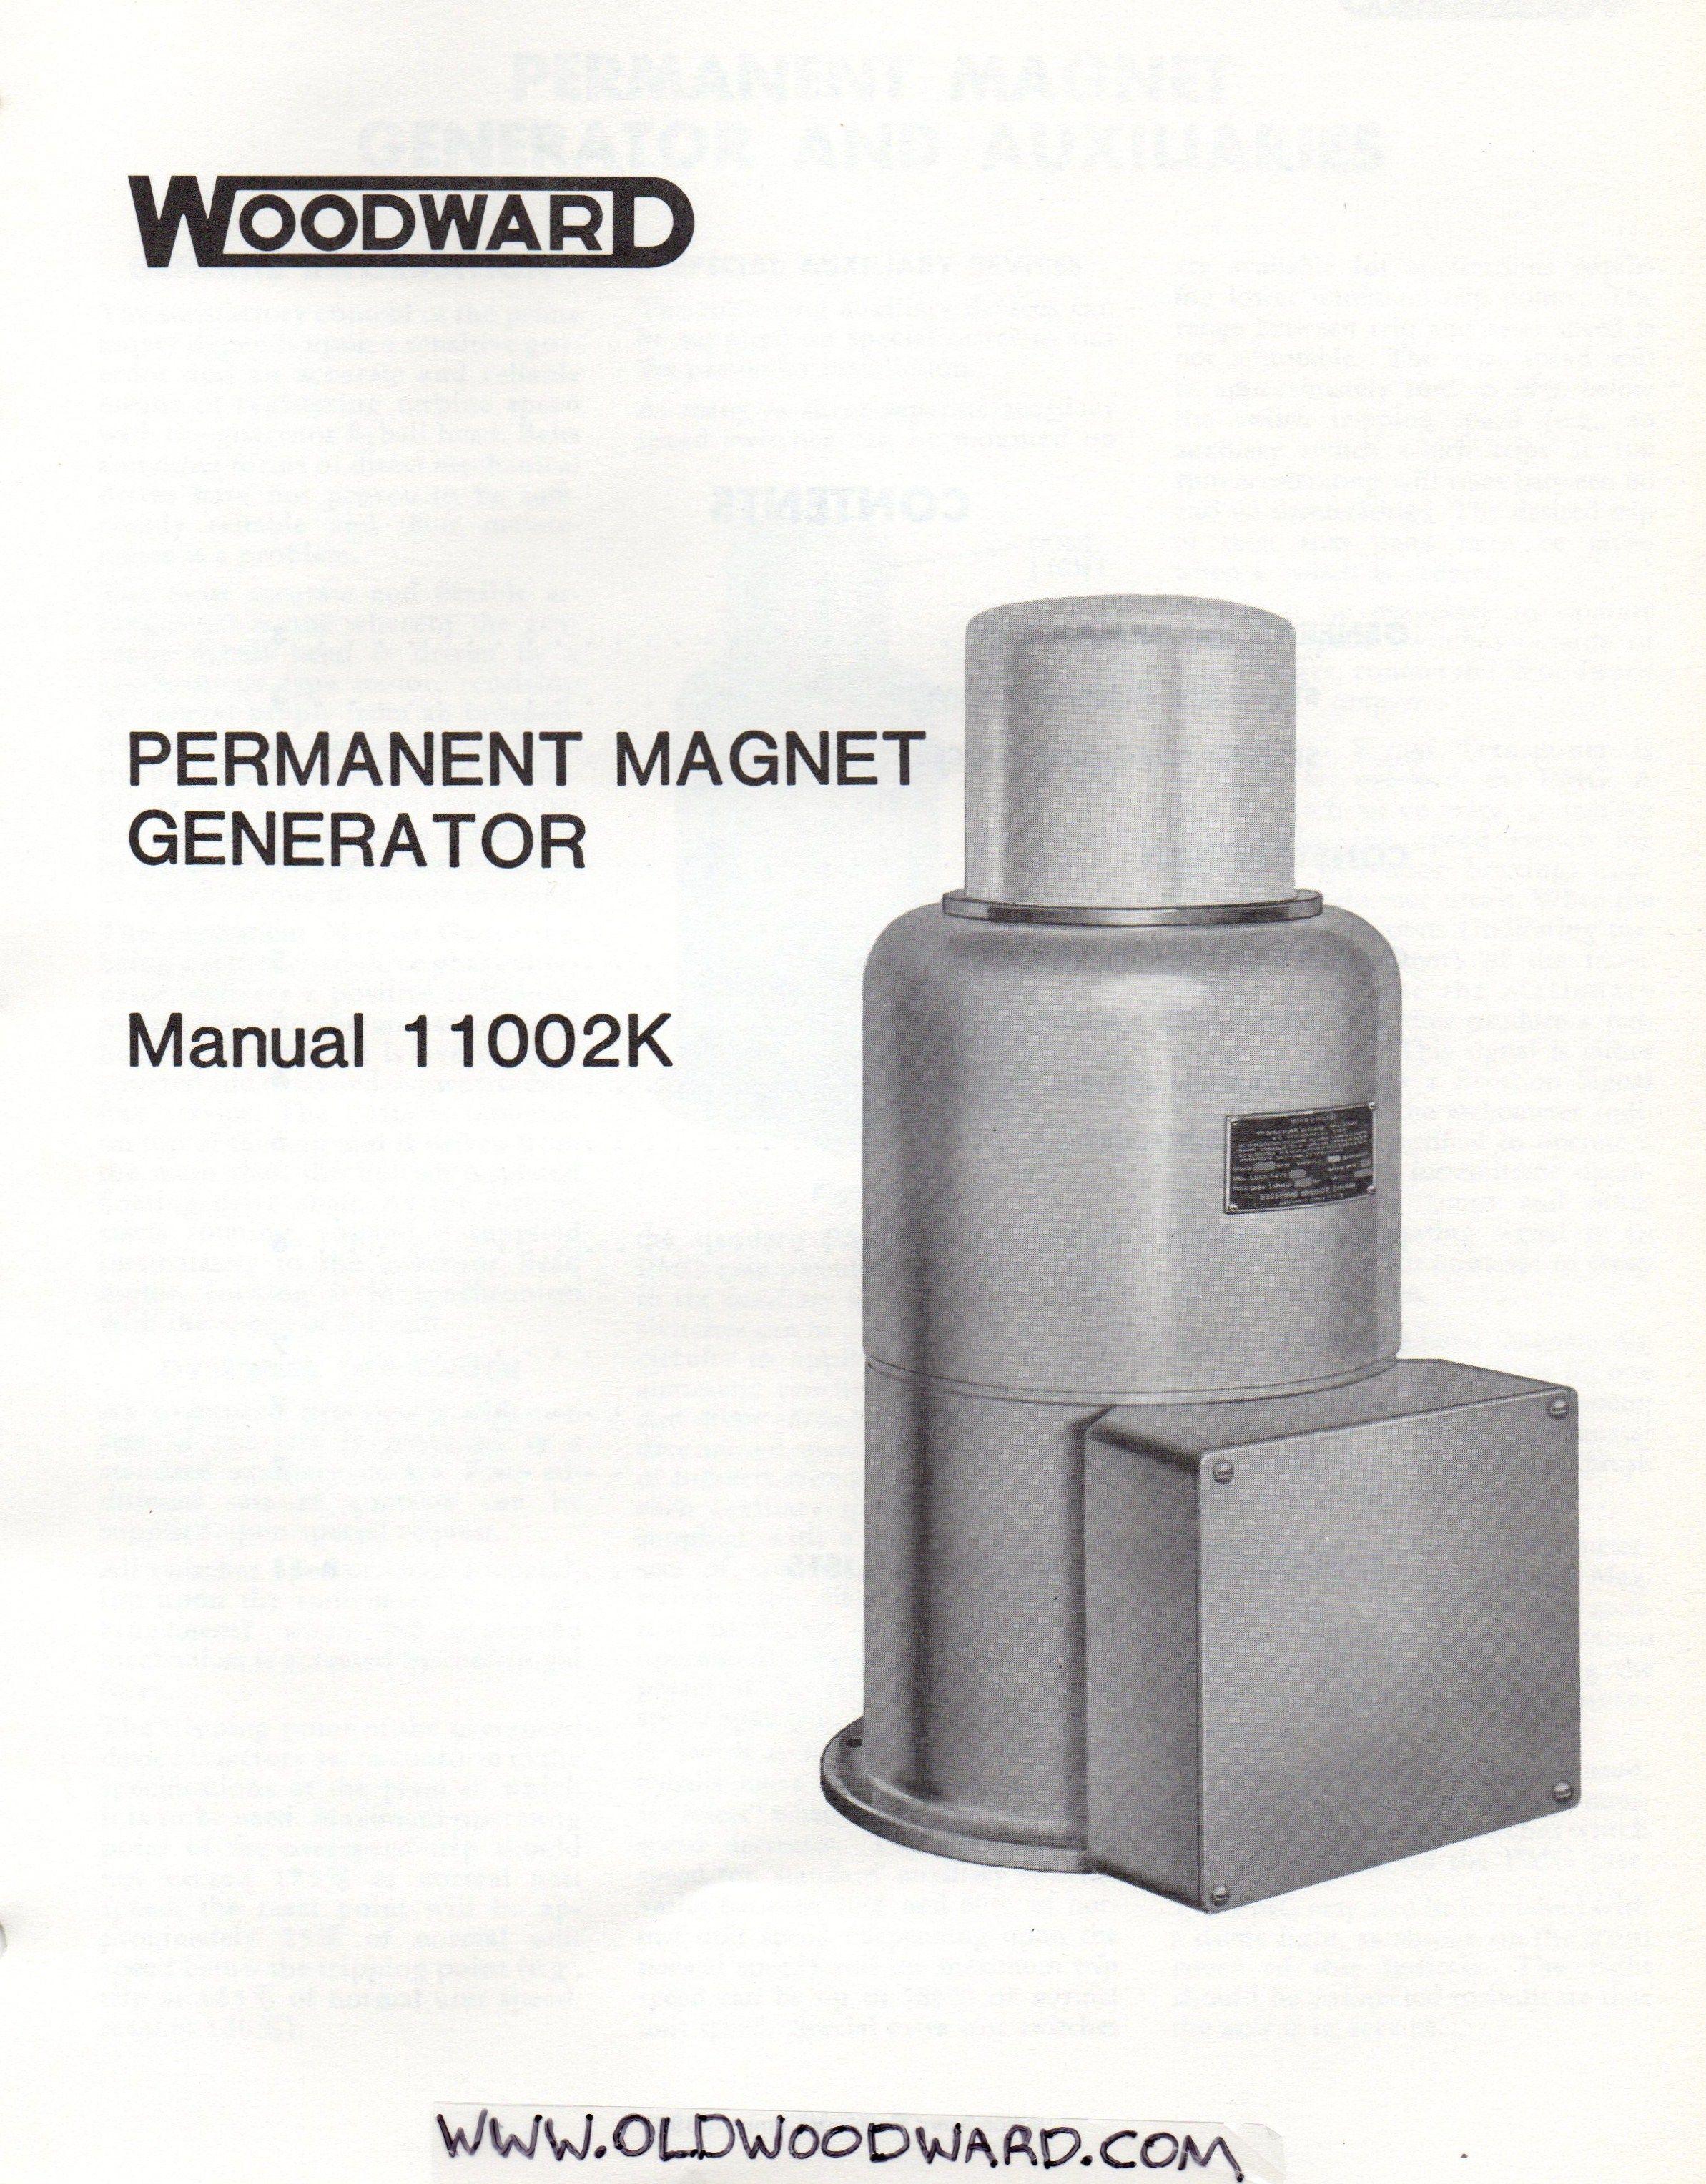 woodward governor company s pmg manual 11002k hydro electric rh pinterest com permanent magnet generator user manual permanent magnet generator construction manual pdf